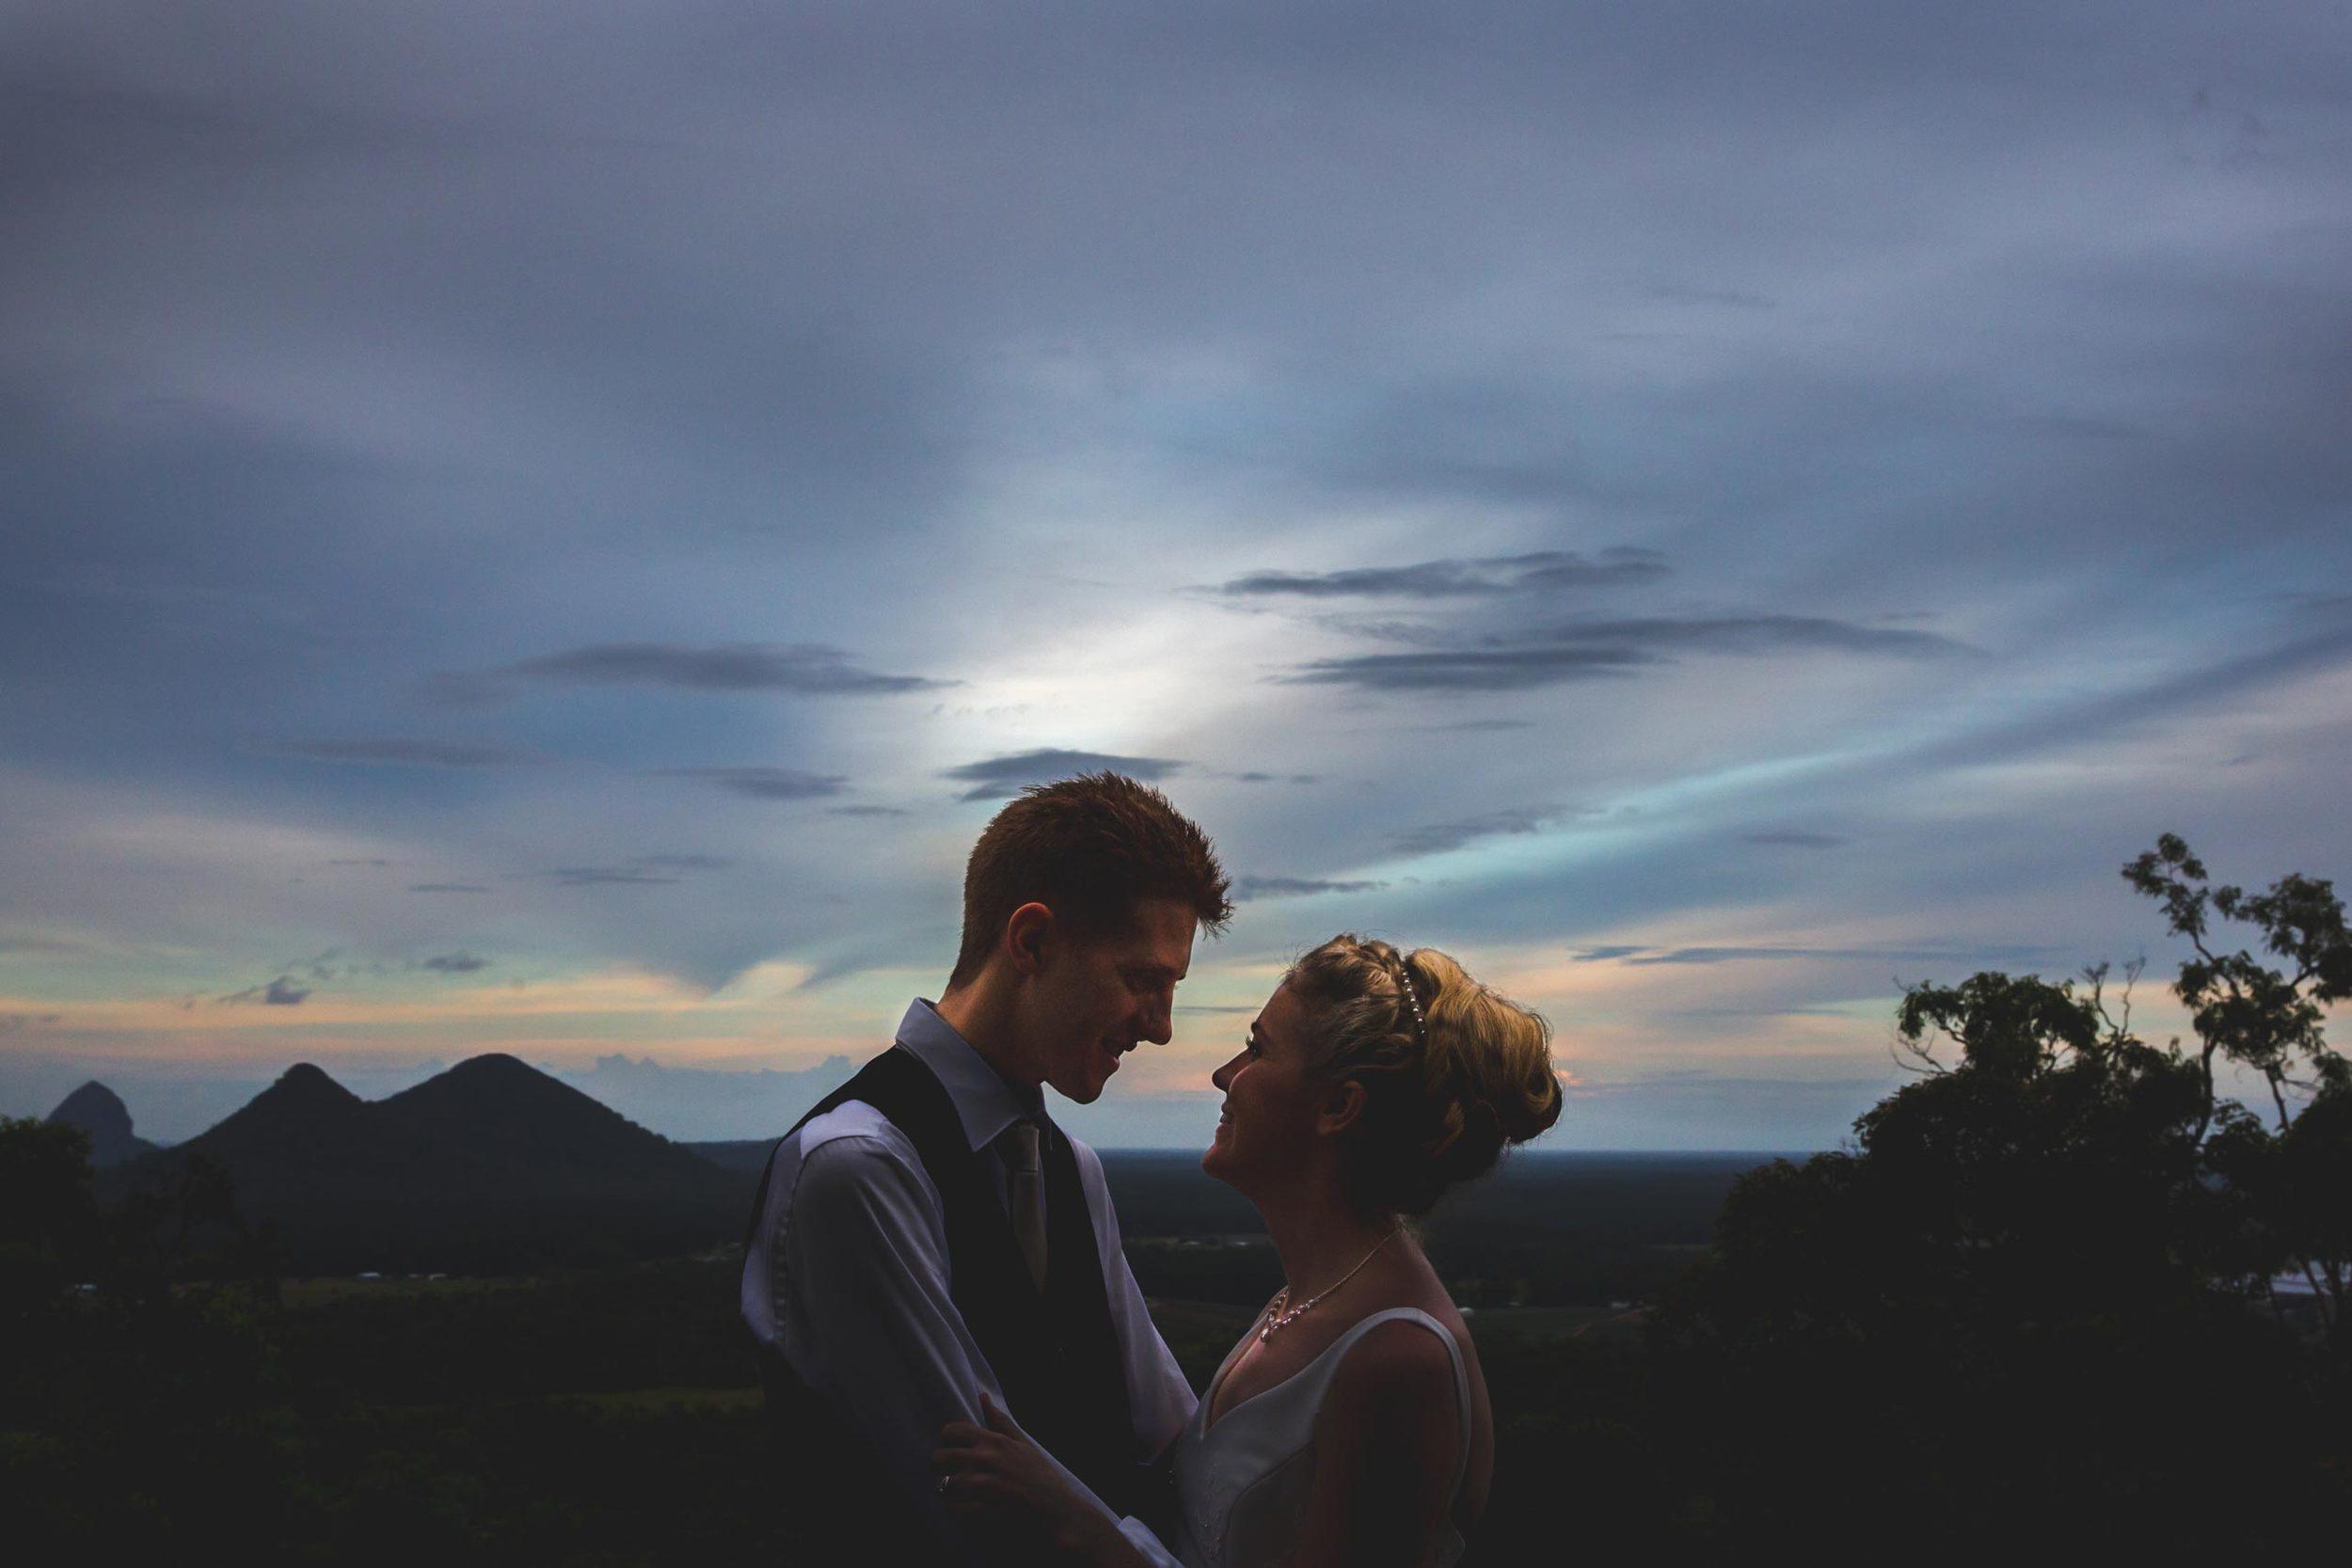 sunshine-coast-wedding-photographer-mooloolaba-maroochydore-maleny-montville-flaxton-noosa-hinterland-caloundra-destination-elopement-photos-best-eco-friendly-7946.jpg